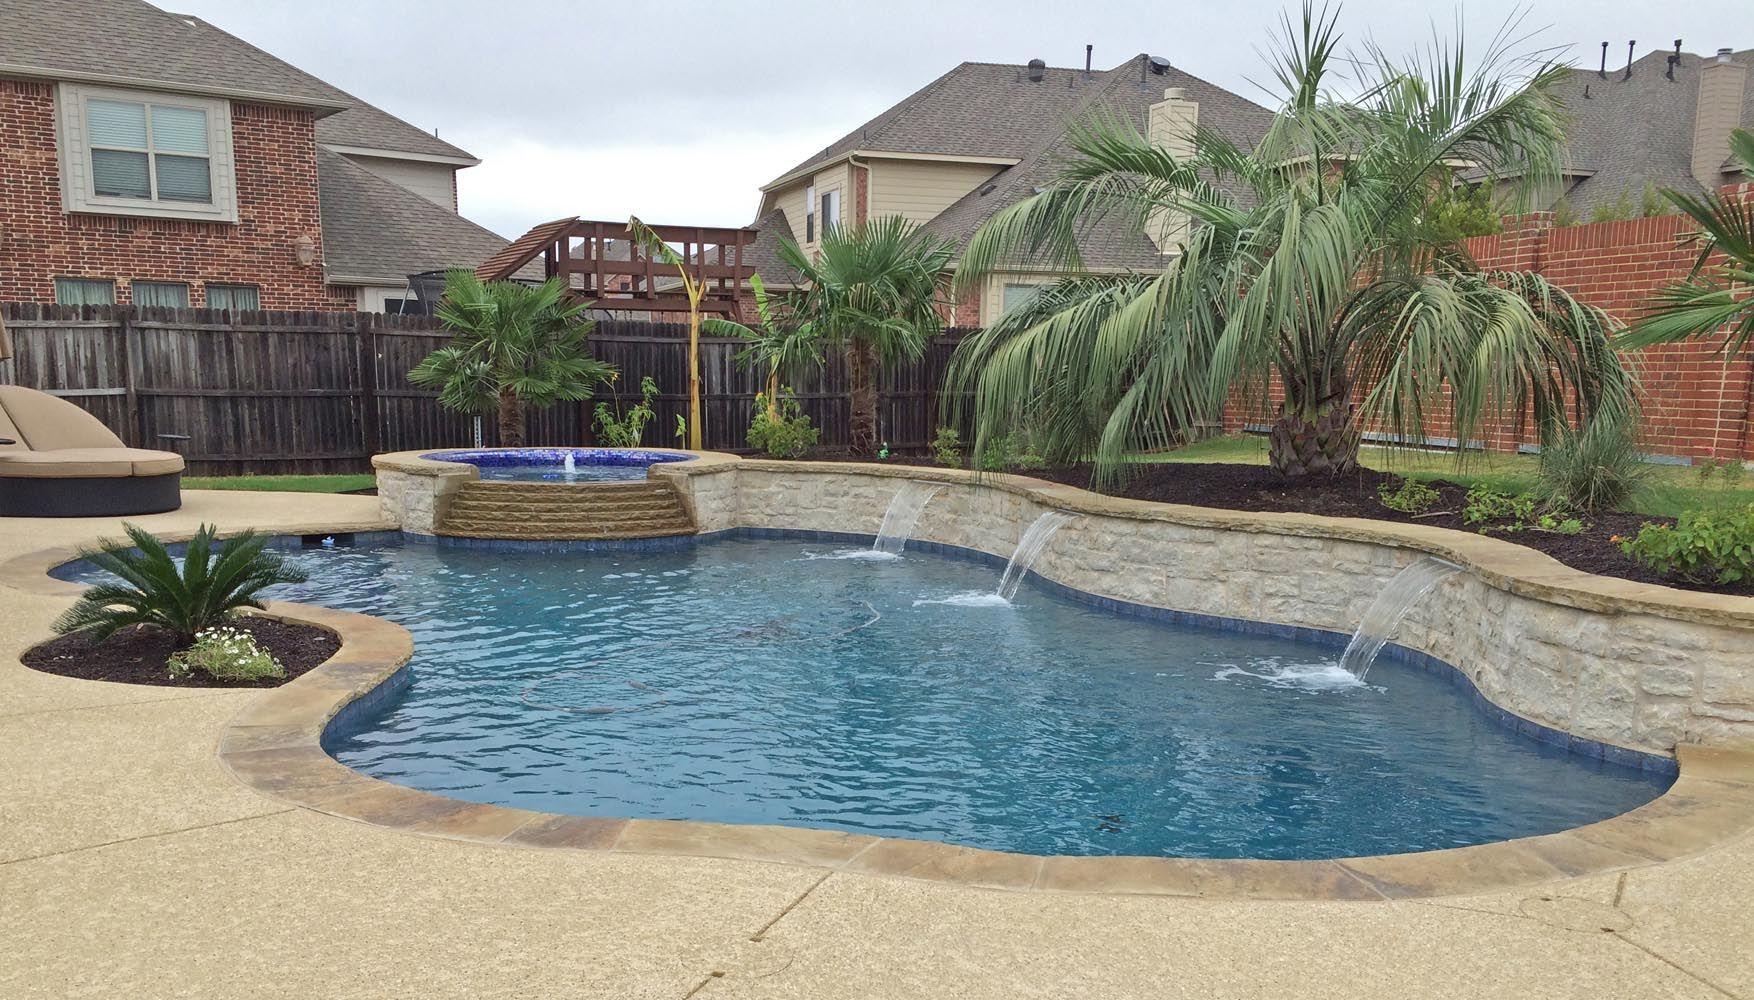 Artesian Custom Pools 9191 Kyser Way 200 Frisco Tx 75033 214 578 3395 Www Artesiancustompools Com With Images Backyard Pool Designs Custom Pools Backyard Pool